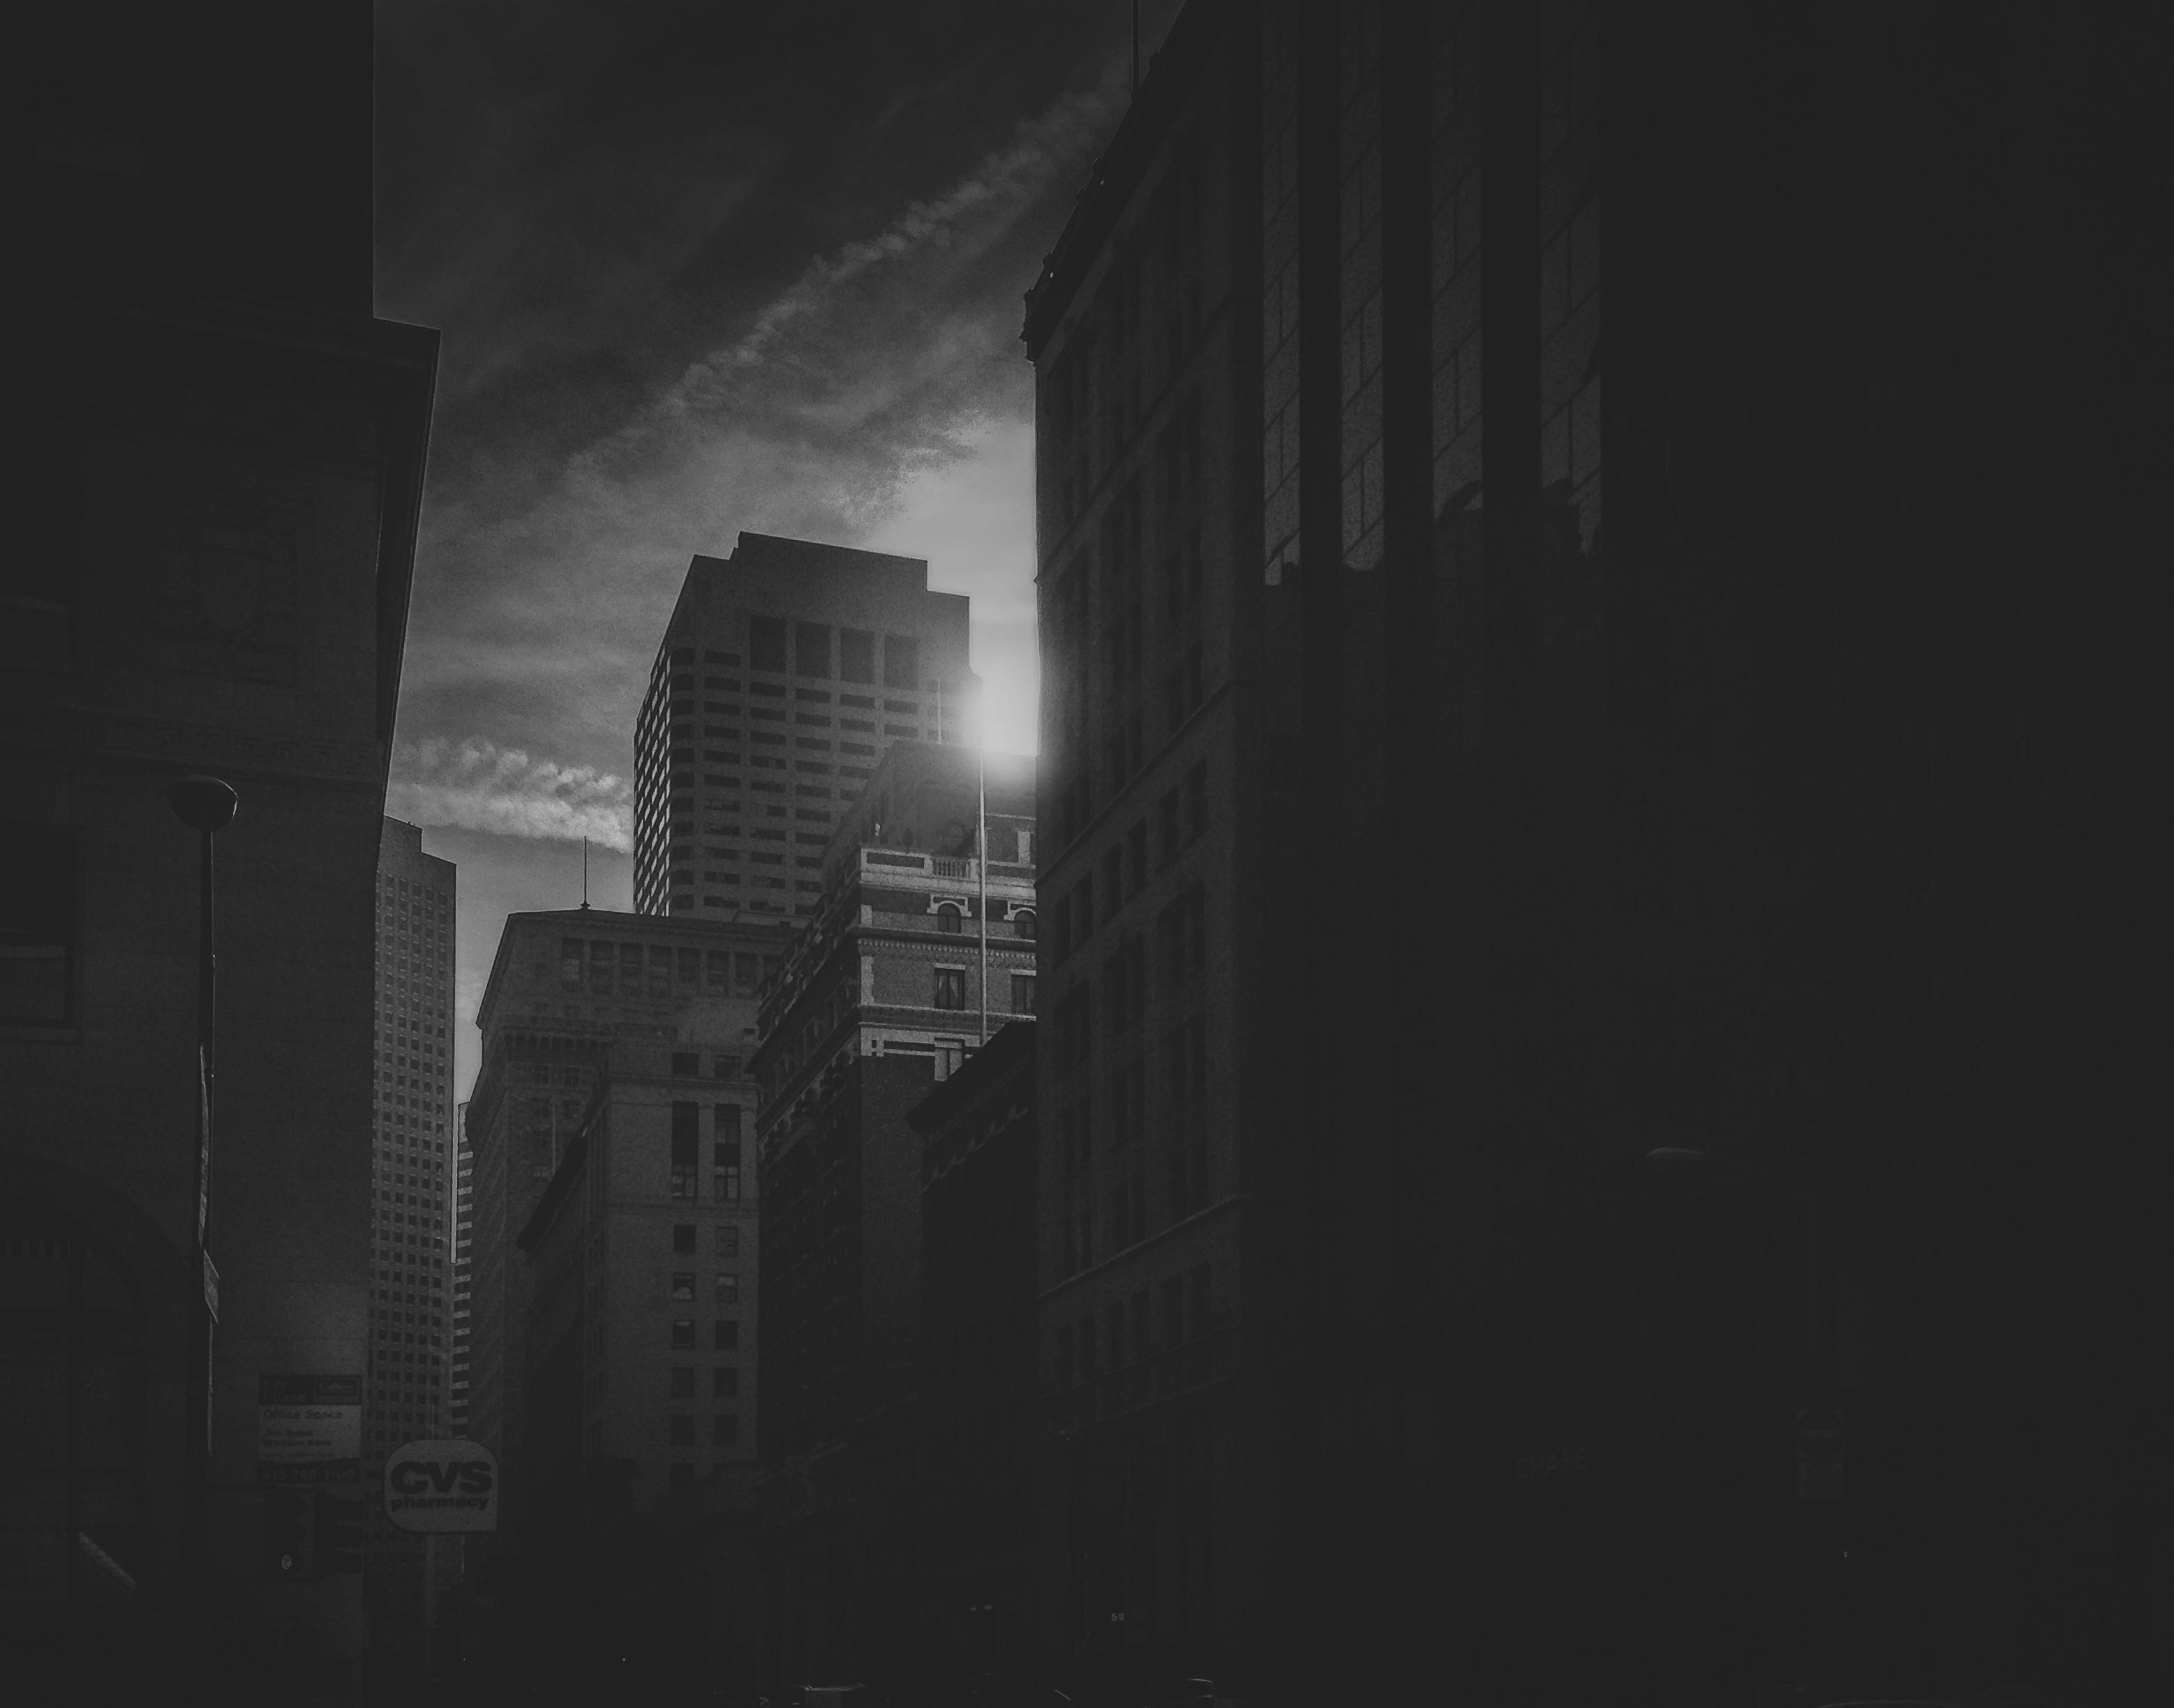 Sanfrancisco California City Sky Urban Blackandwhite Sun Cali Buildings Dark Blackwhite Scary Downtown Glow Glare Skyscrapers